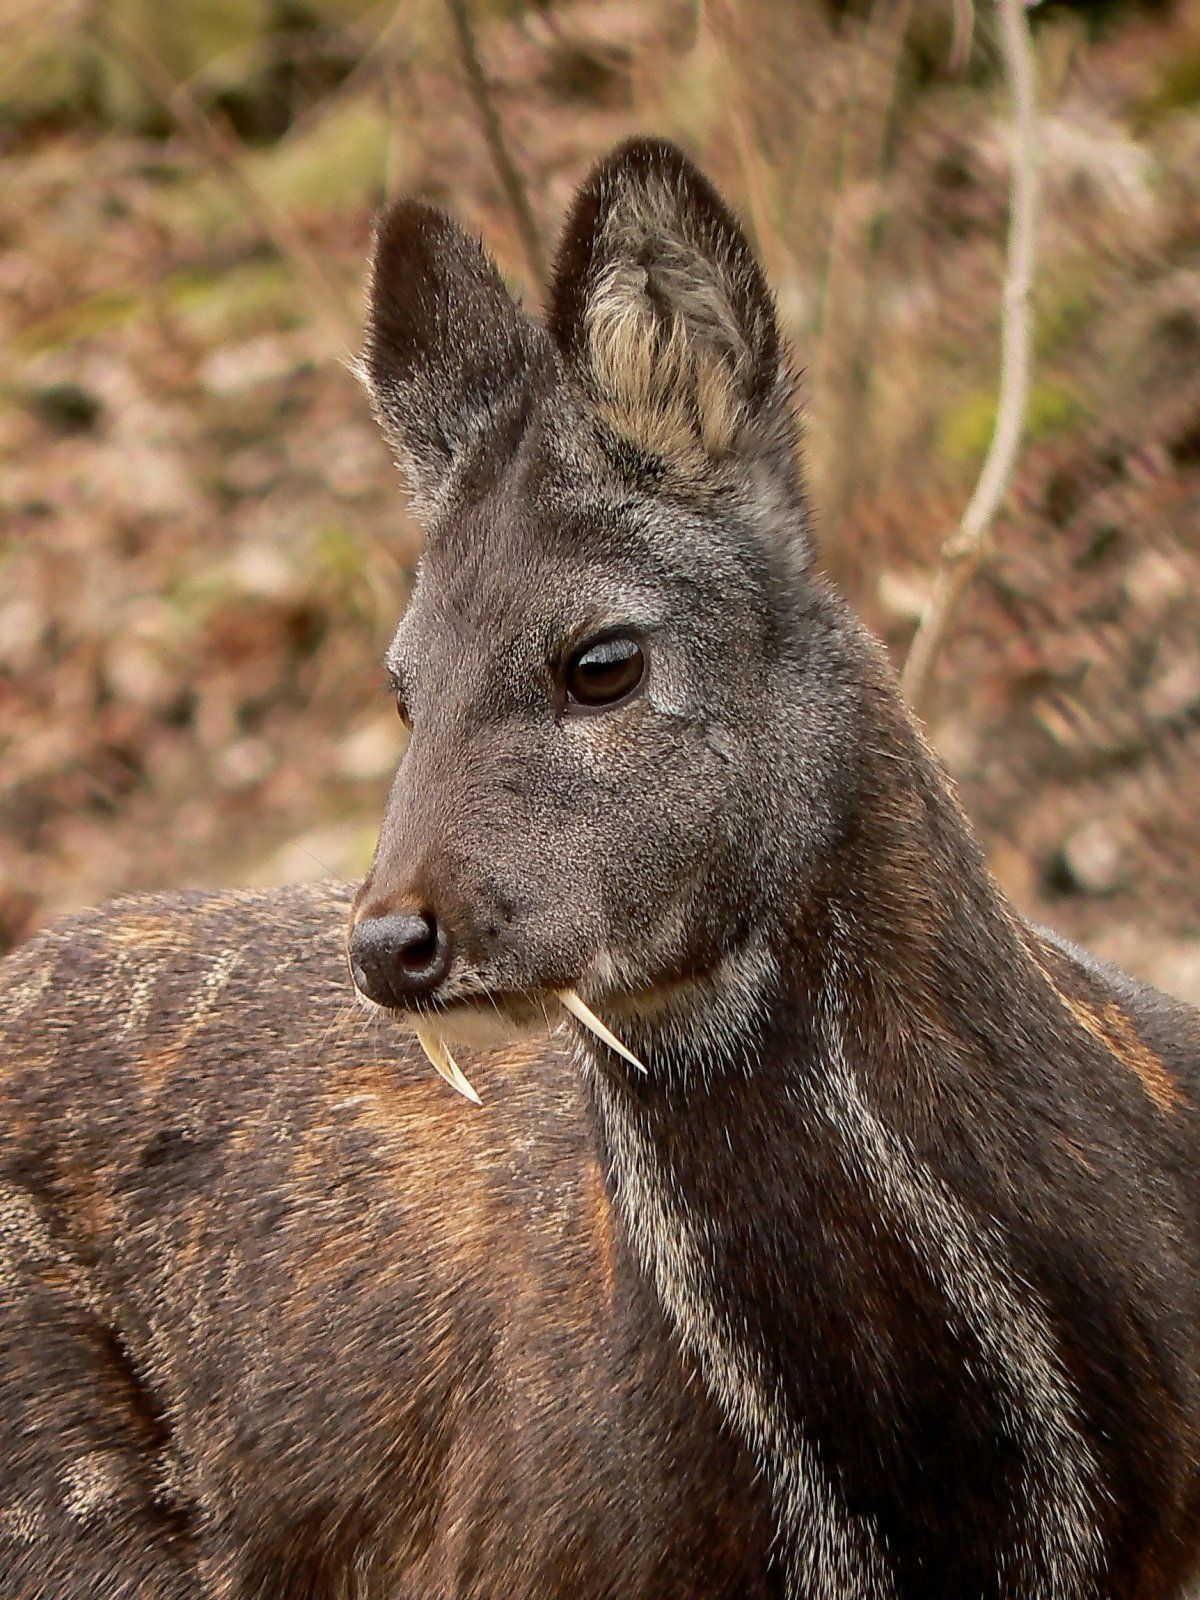 The Vampire Deer Is A Nickname For A Kashmir Musk Deer Long